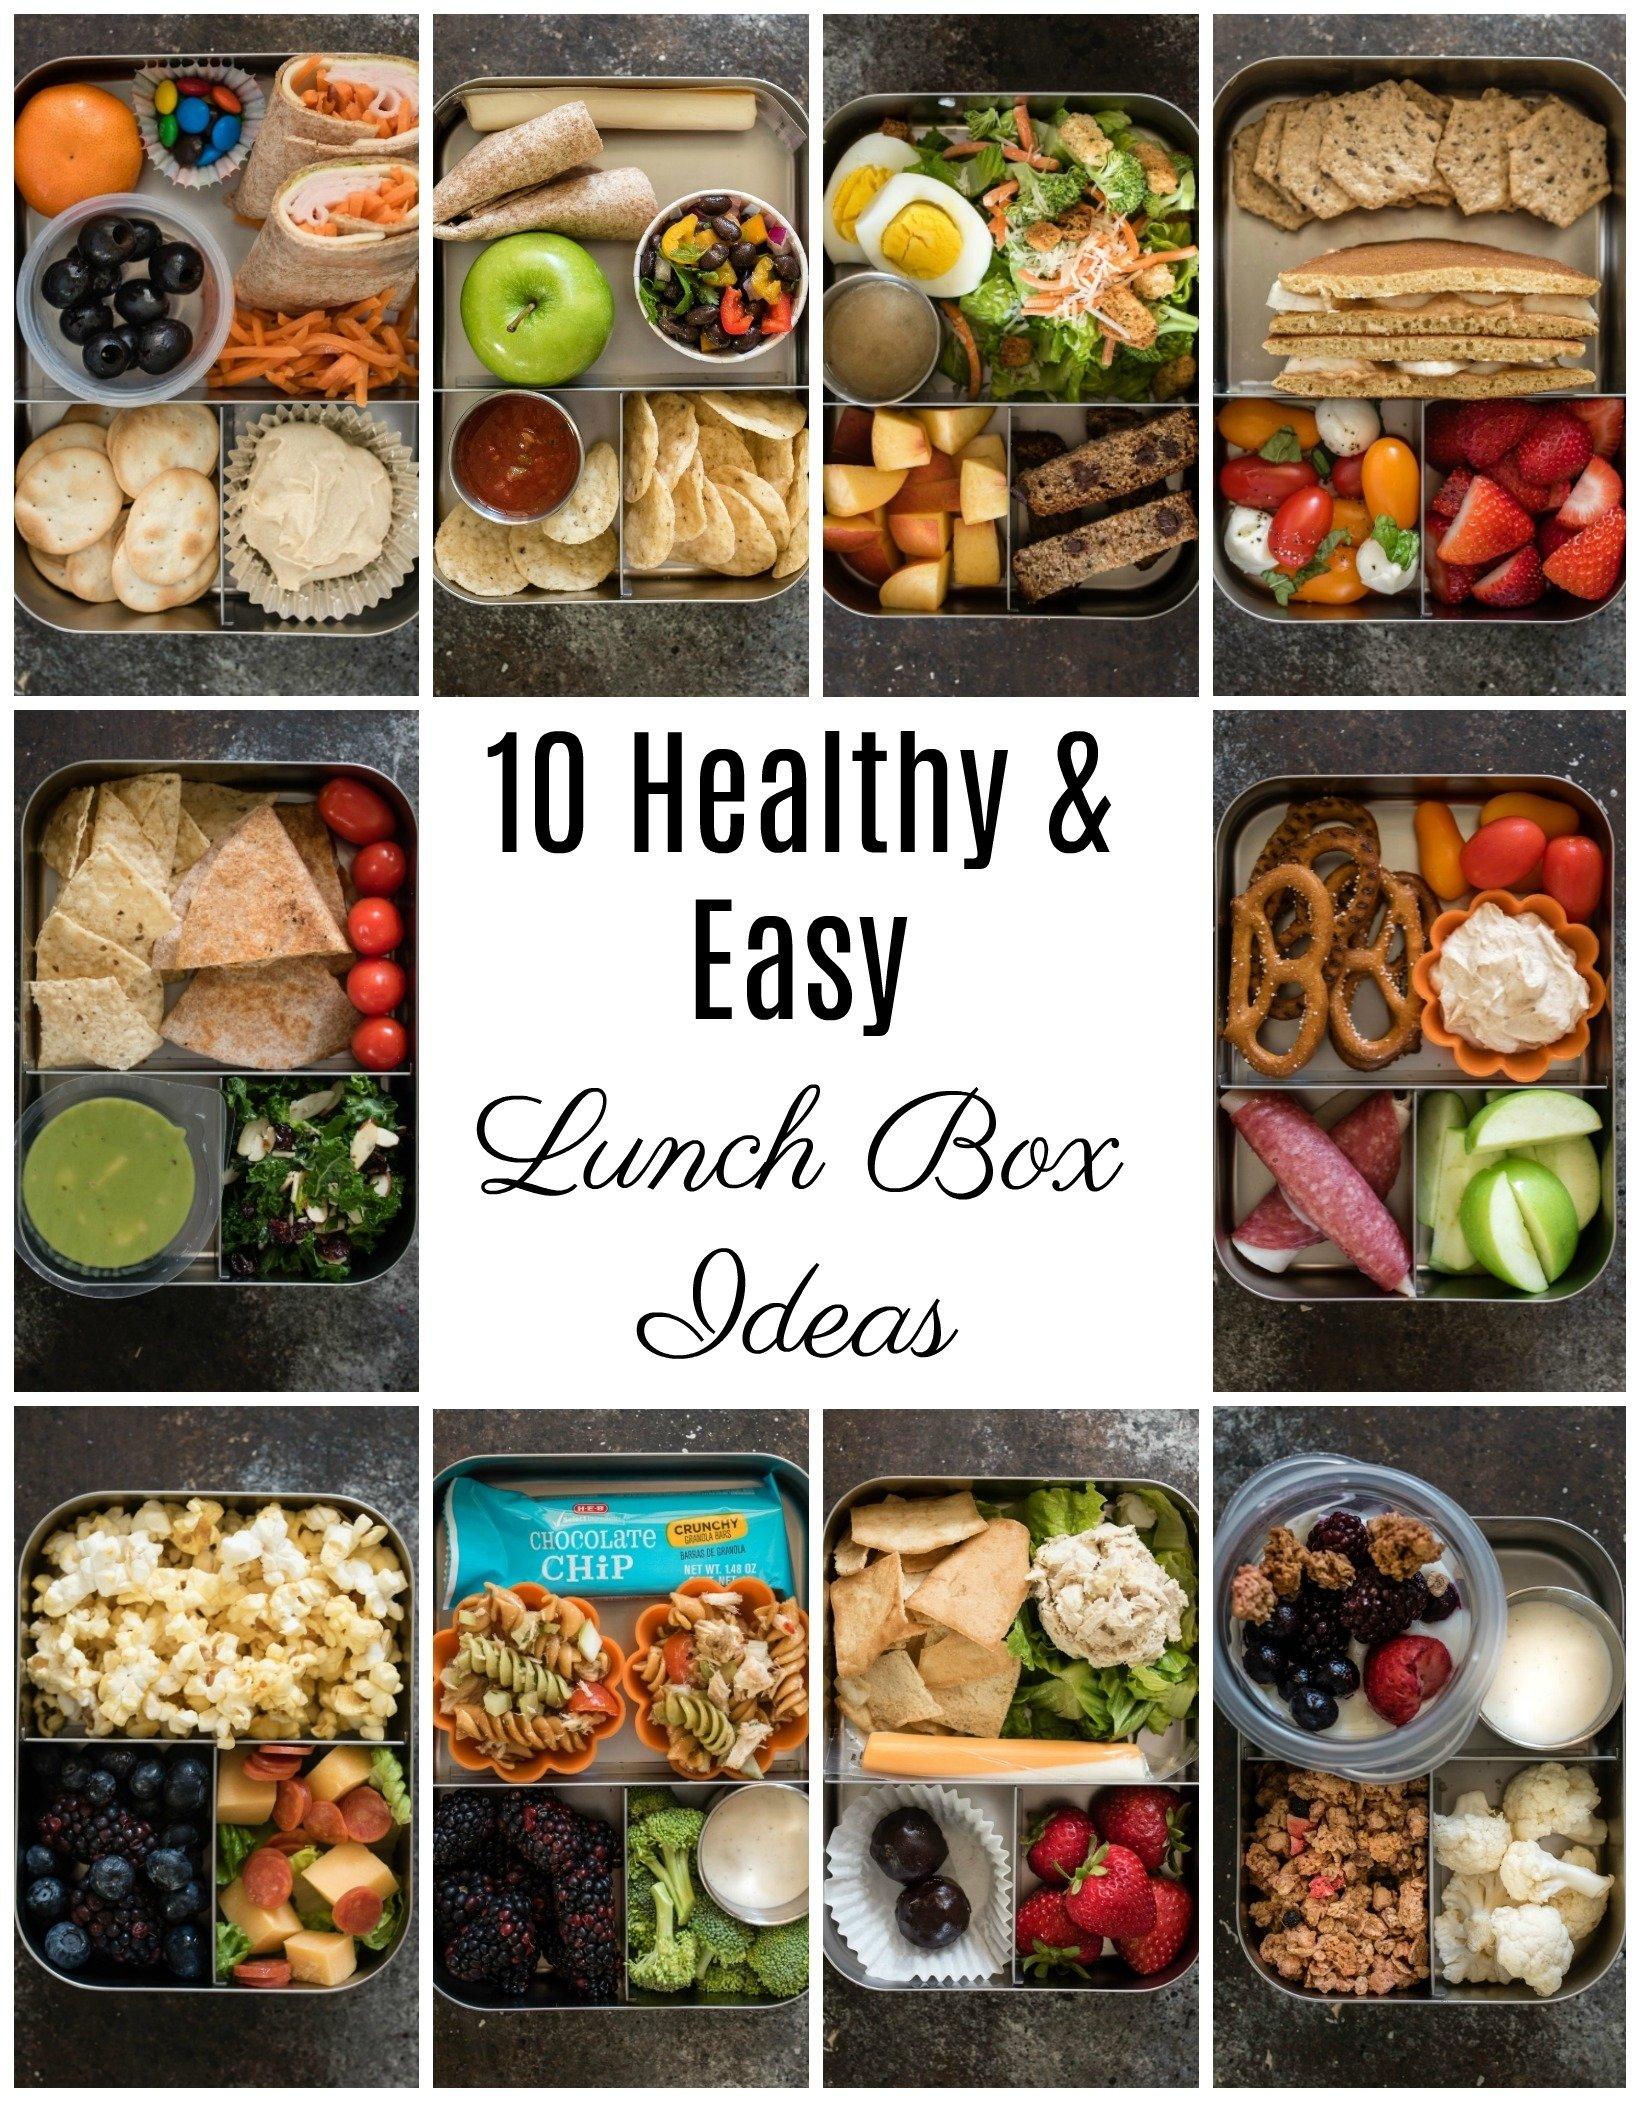 pancake pb banana sandwich and 10 healthy lunch box ideas